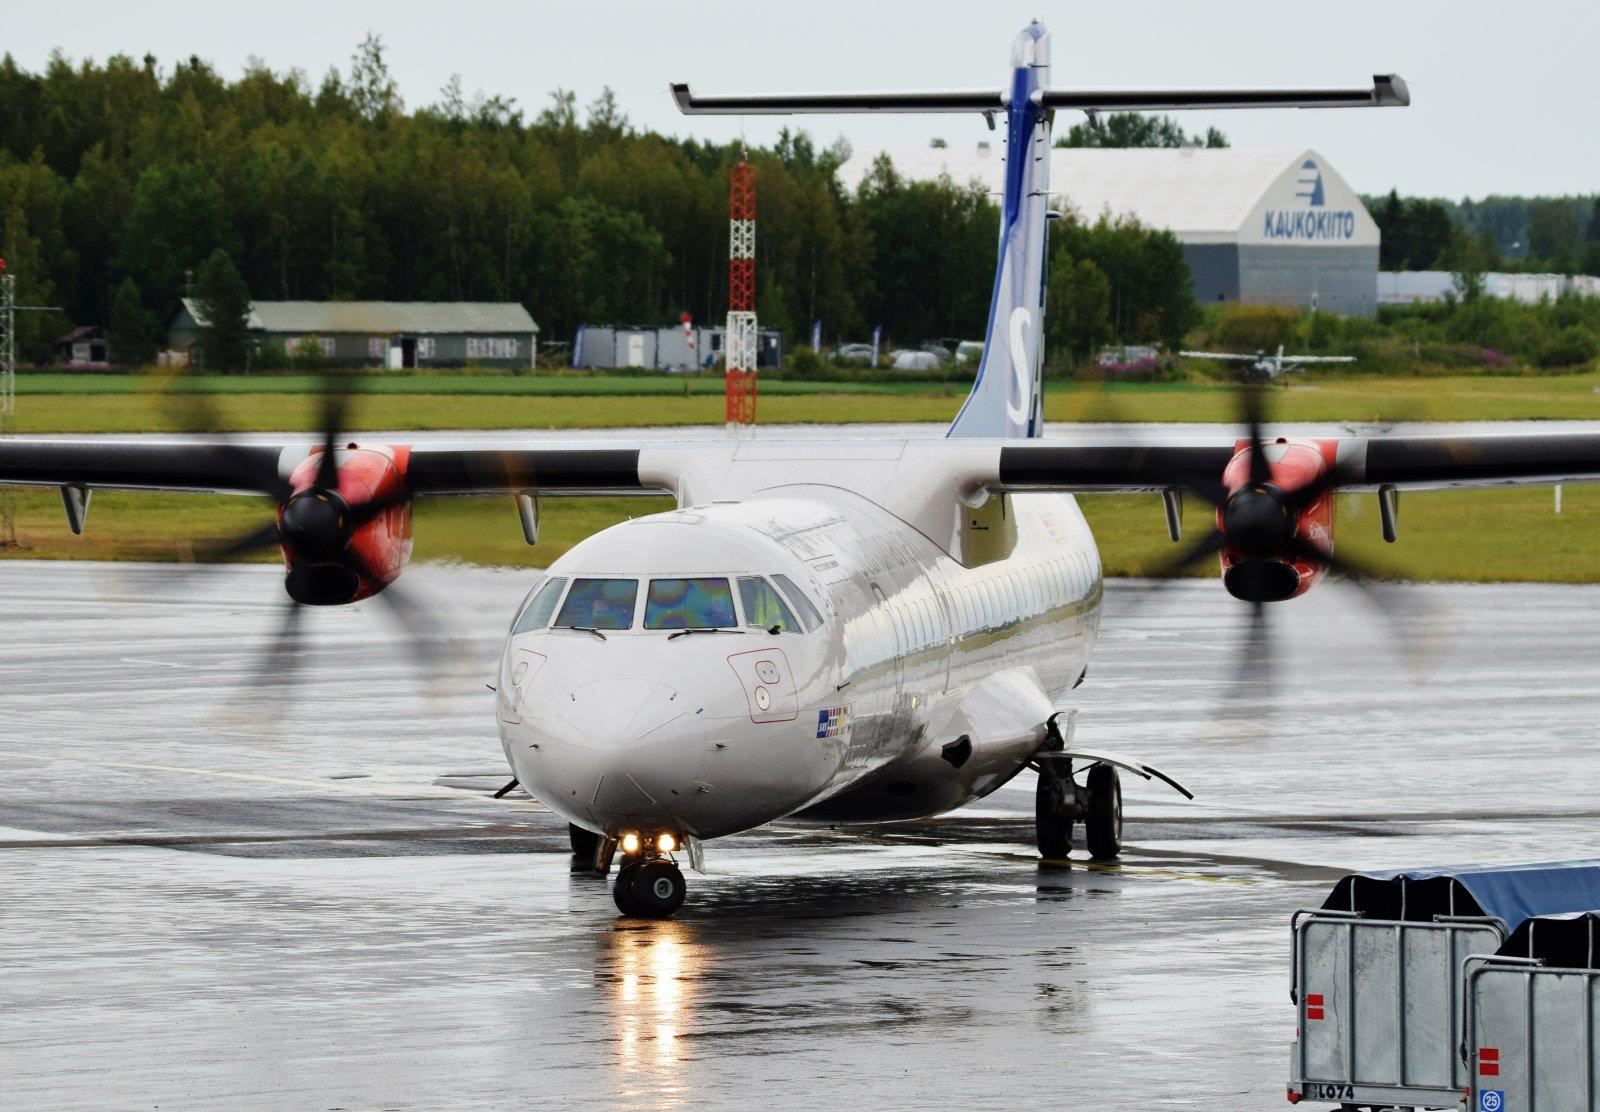 ES-ATG - ATR 72-600 - Nordica (SAS Scandinavian Airlines) - 15.7.2019